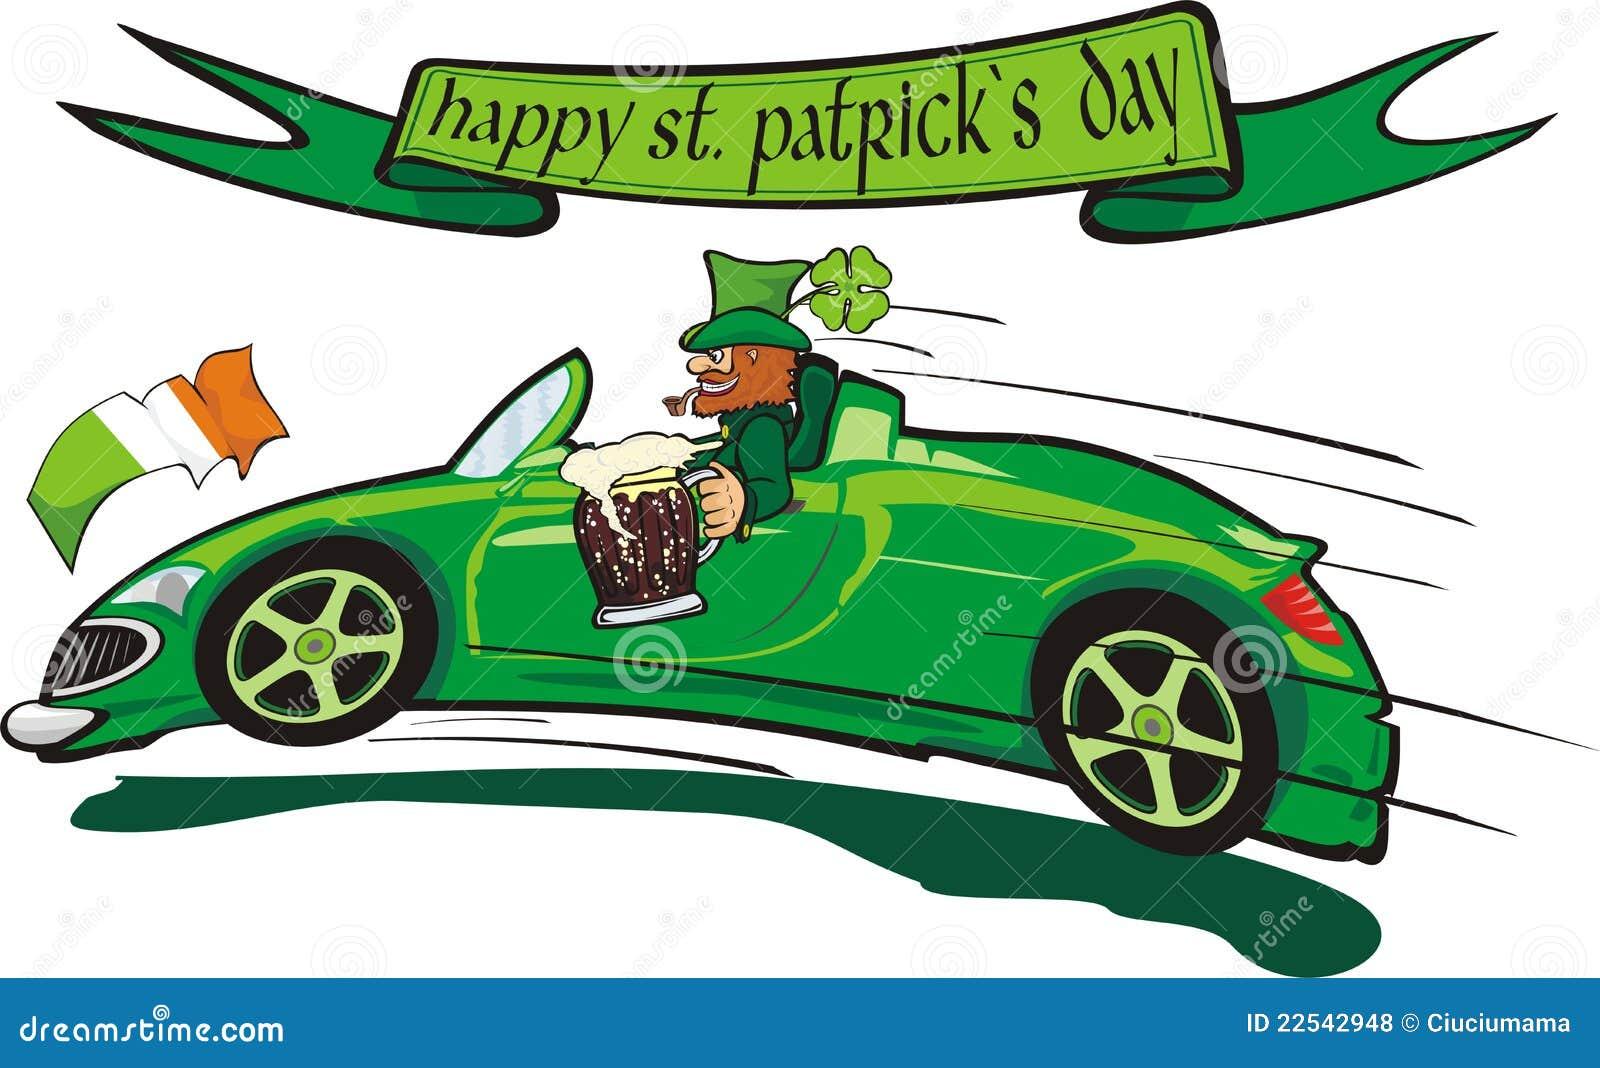 Leprechaun And Happy St Patricks Day Royalty Free Stock